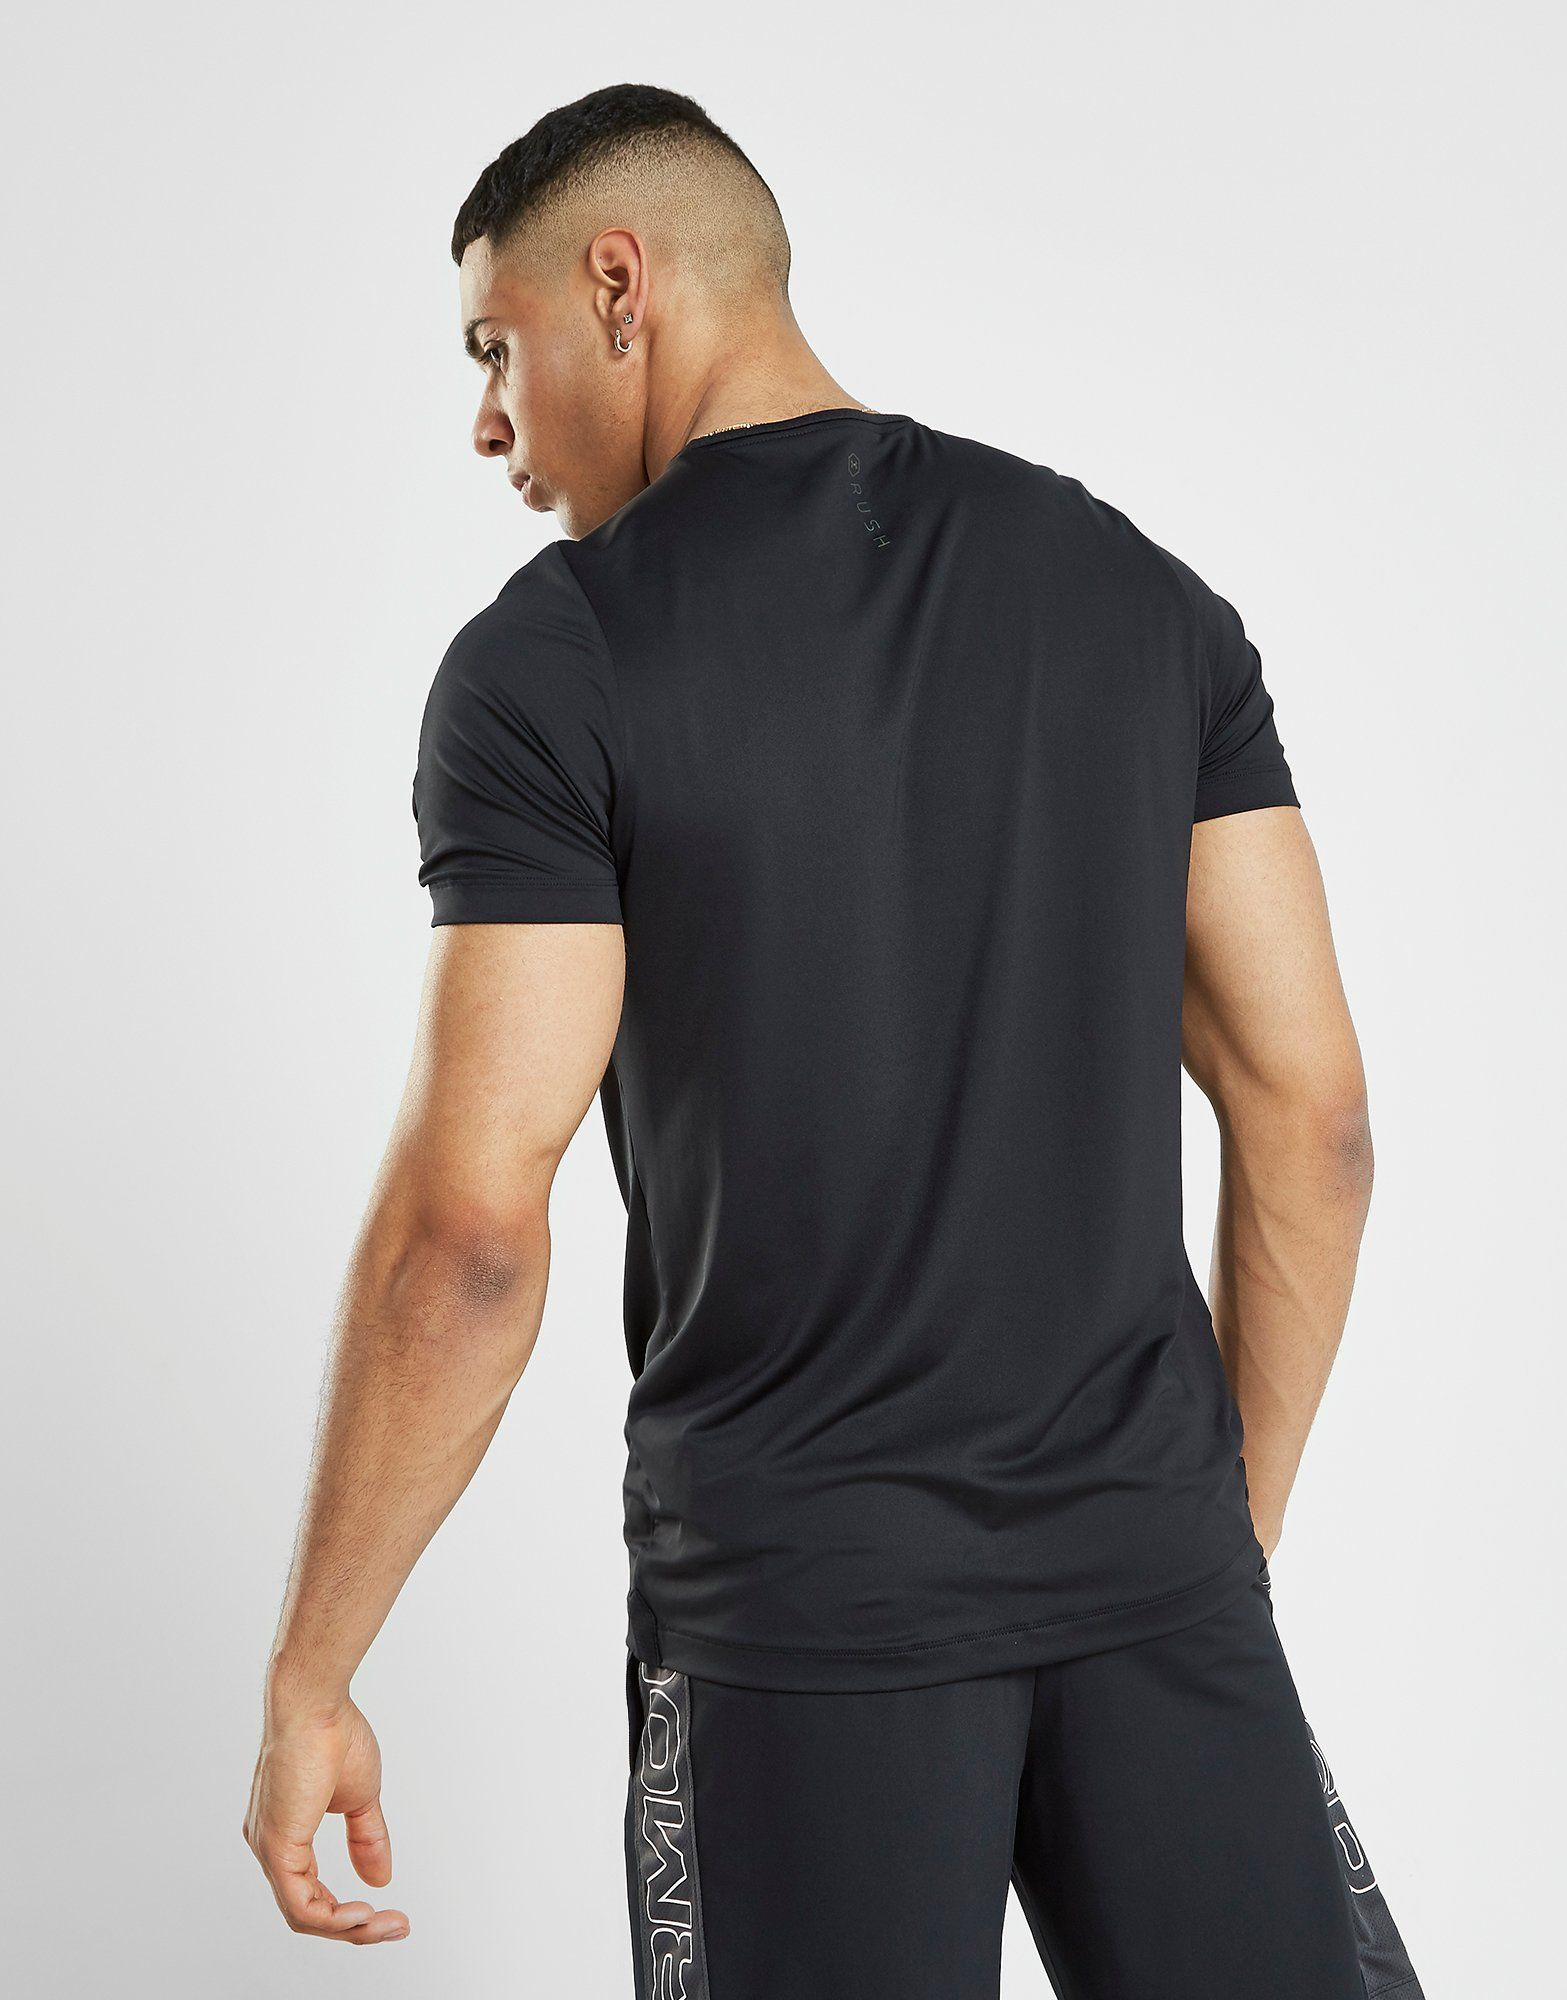 Under Armour RUSH Short Sleeve T-Shirt